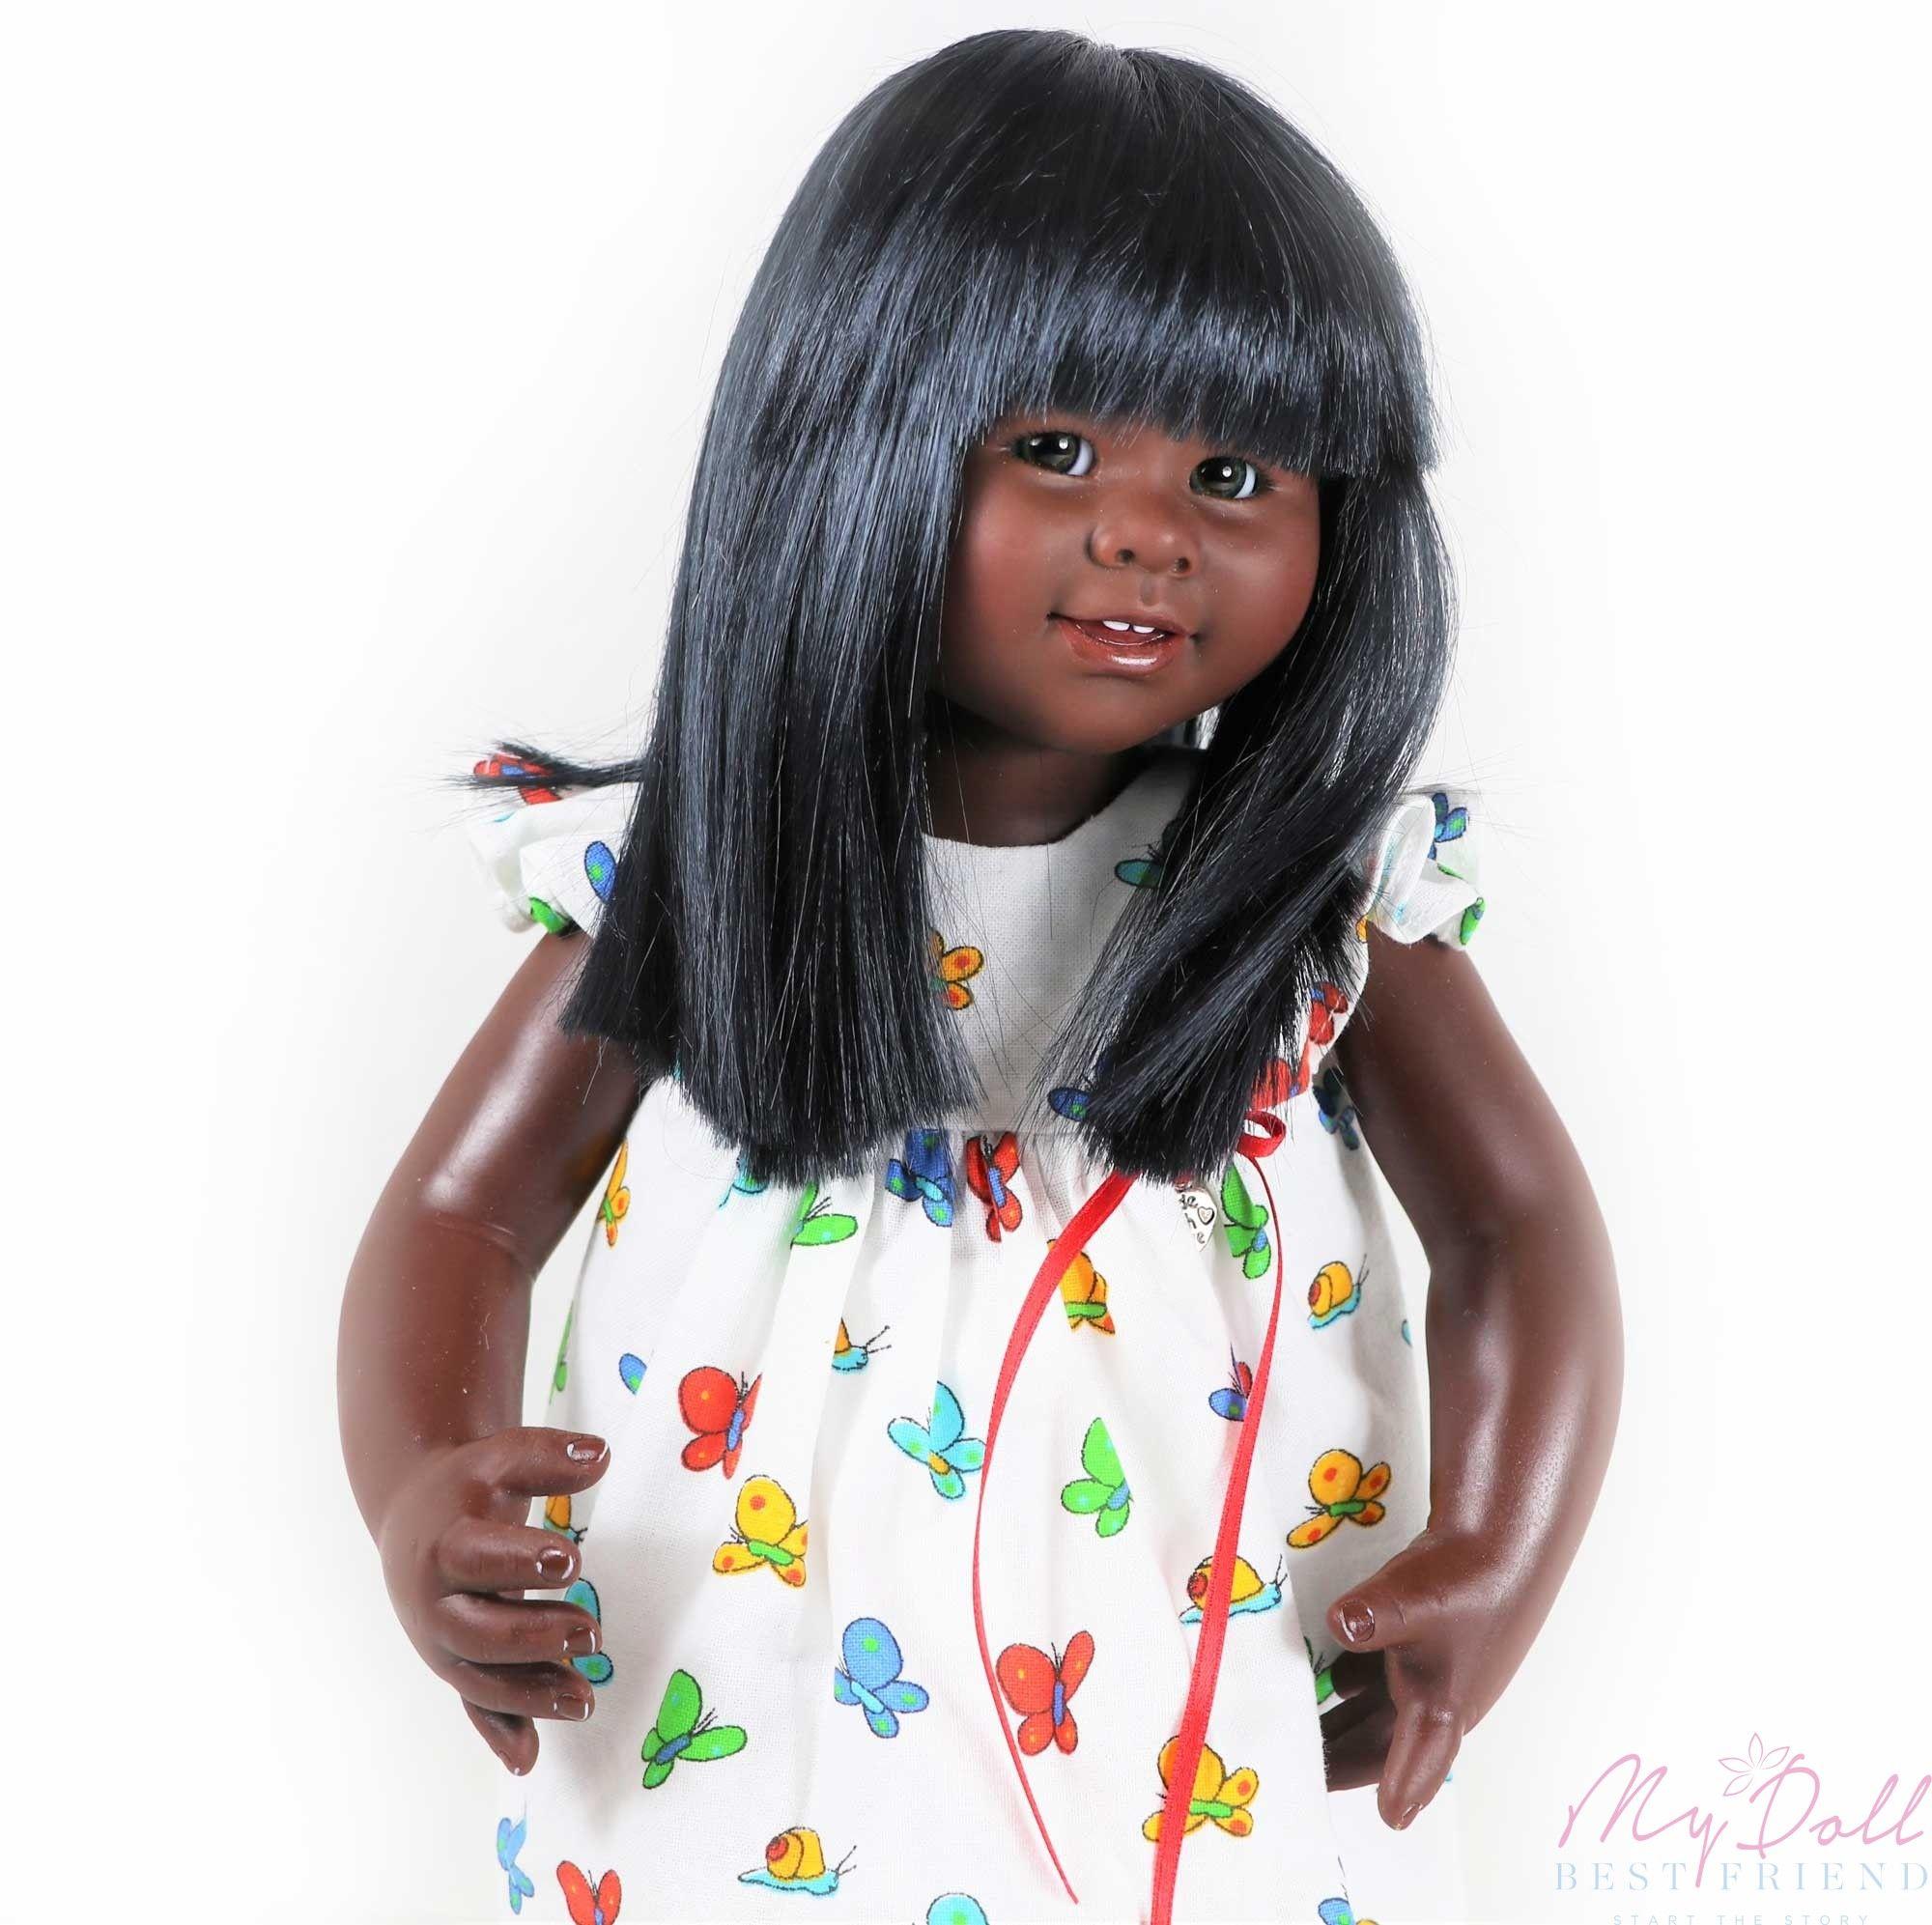 Holly by Rosemarie Muller 32cm Wichtel MIO face Black Doll